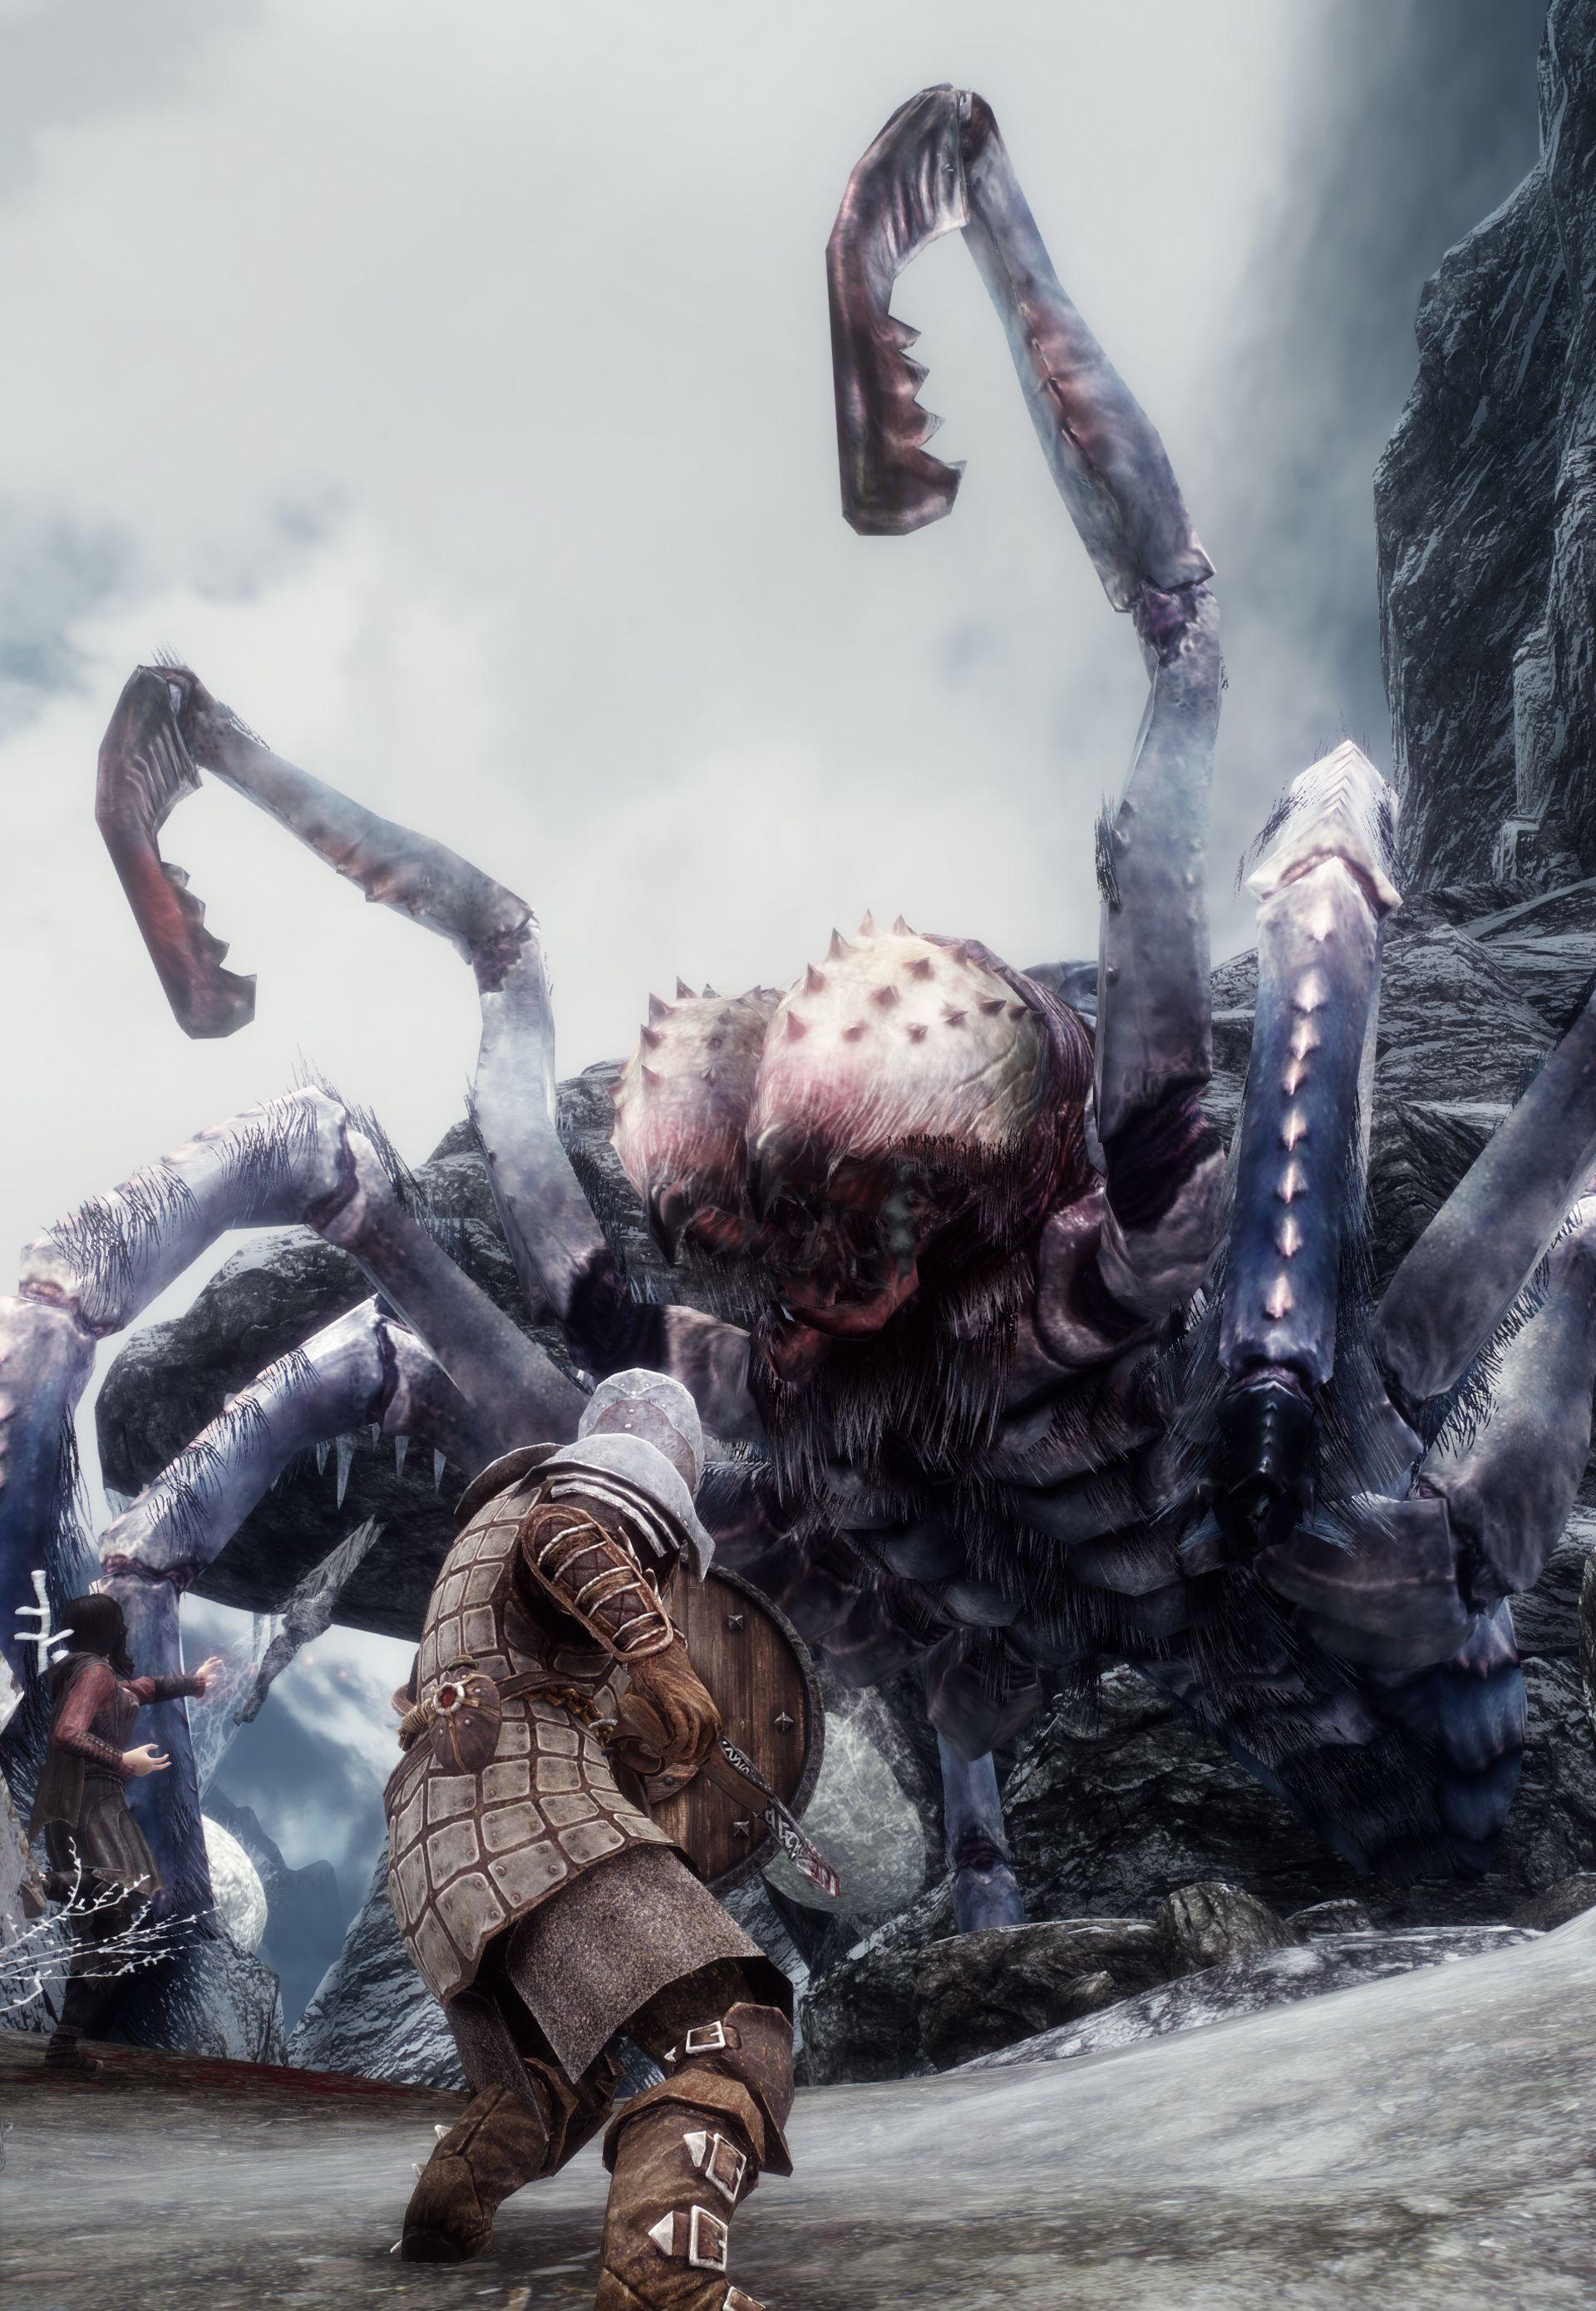 Itsy  Bitsy  #games #Skyrim #elderscrolls #BE3 #gaming #videogames